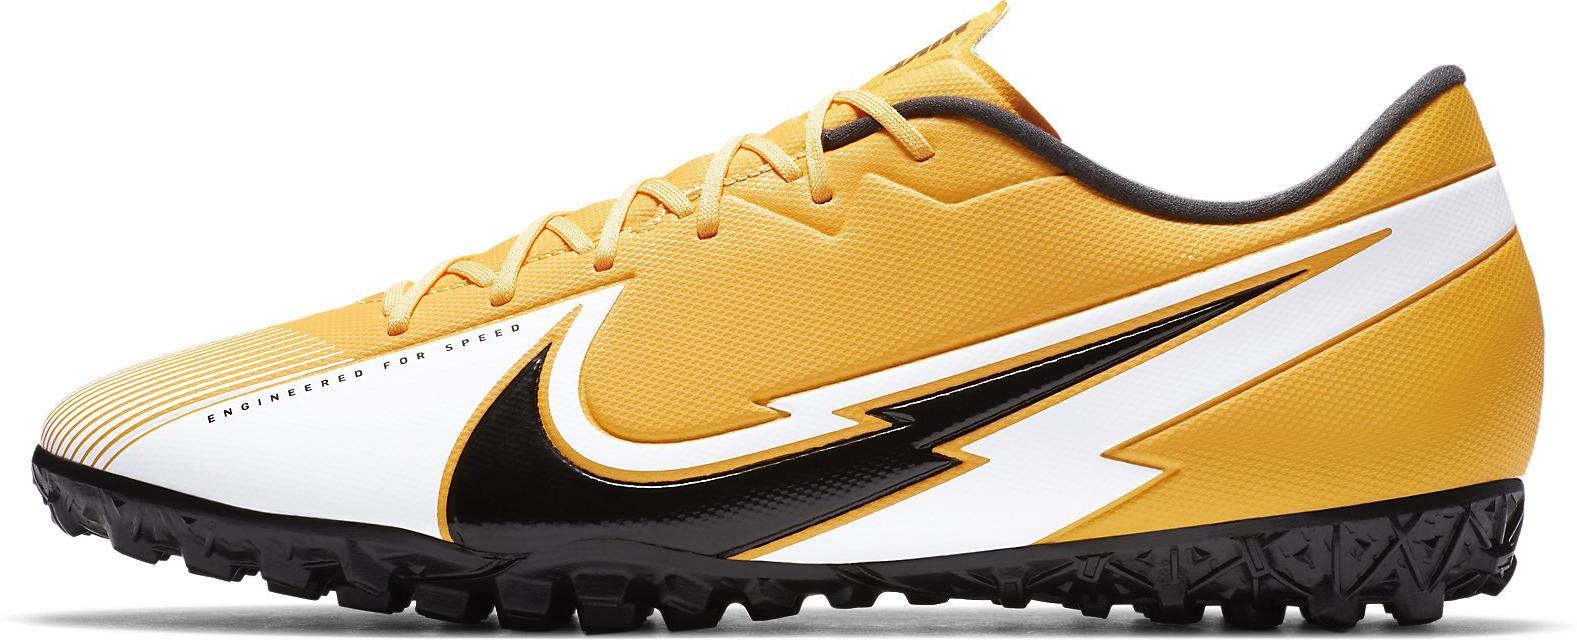 Kopačky Nike VAPOR 13 ACADEMY TF